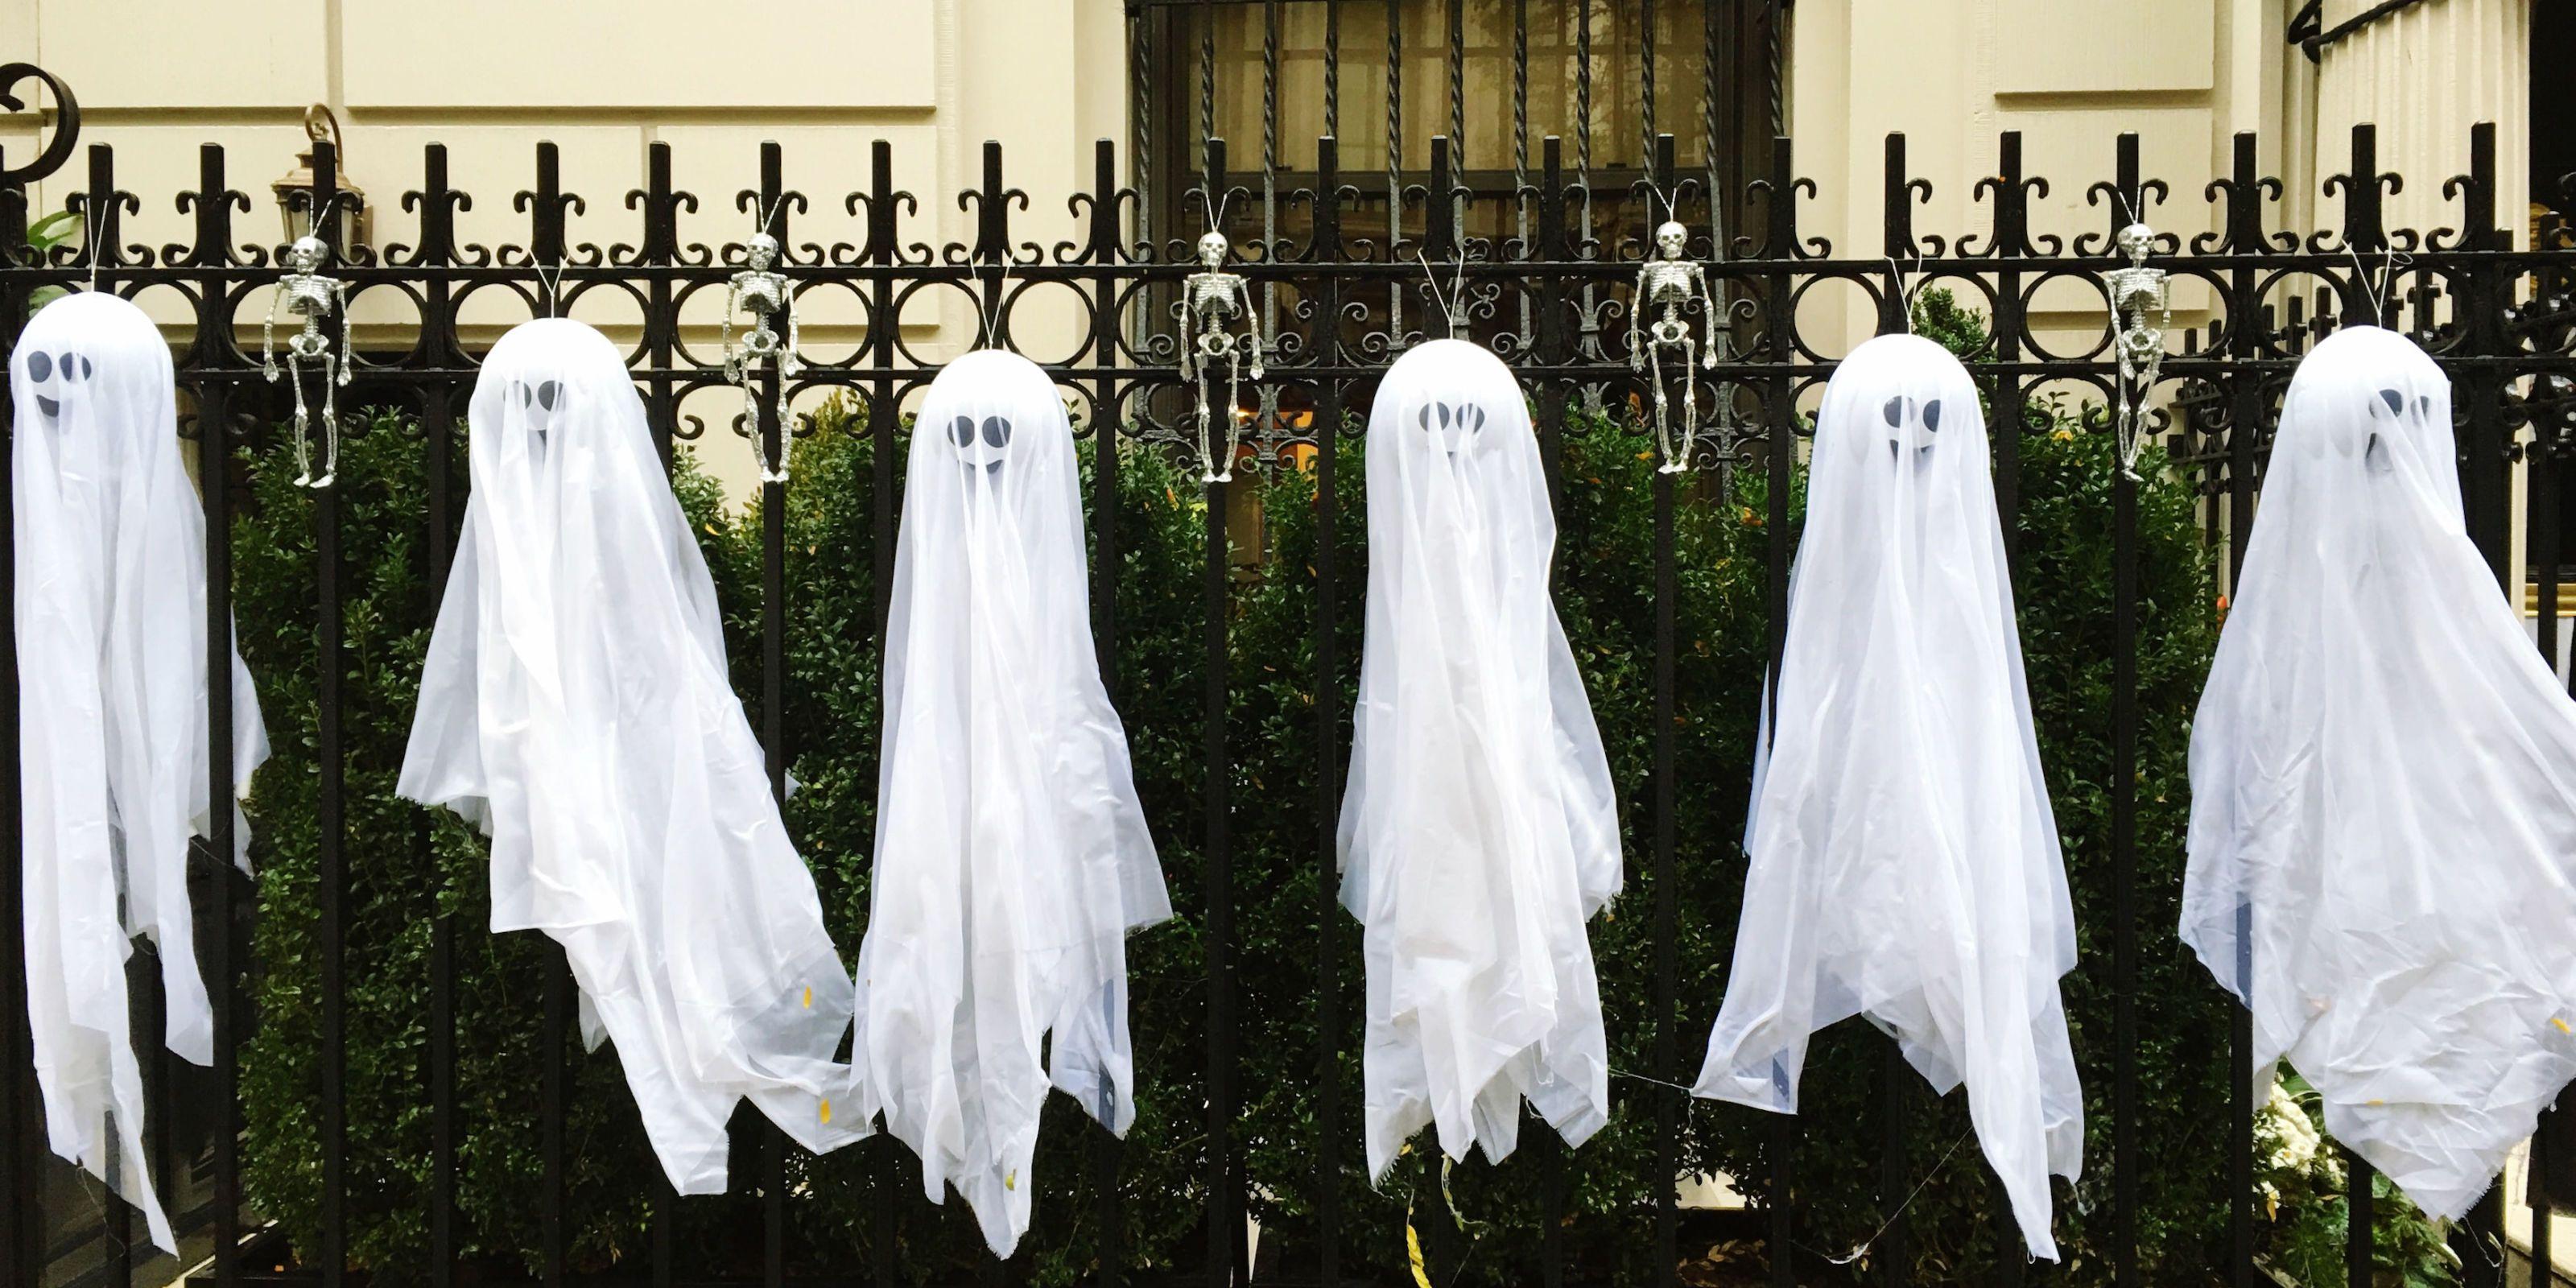 10 Best Outdoor Halloween Decorations , Porch Decor Ideas